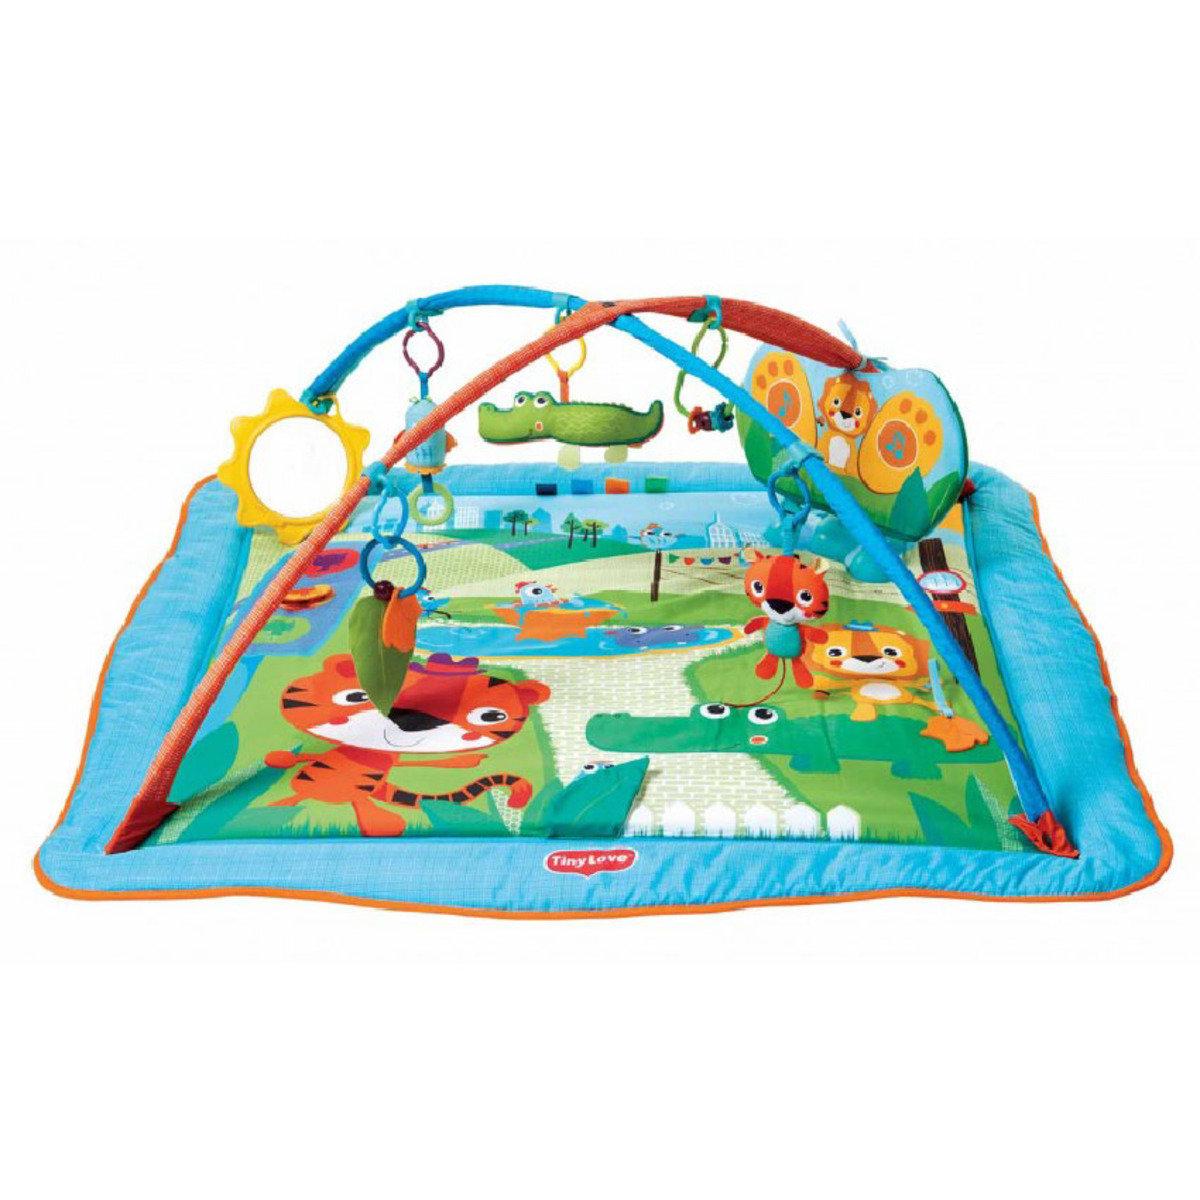 Tiny Love Gymini Kick Play City Safari Hktvmall Online Shopping Baby Gift Aquarium Playgym